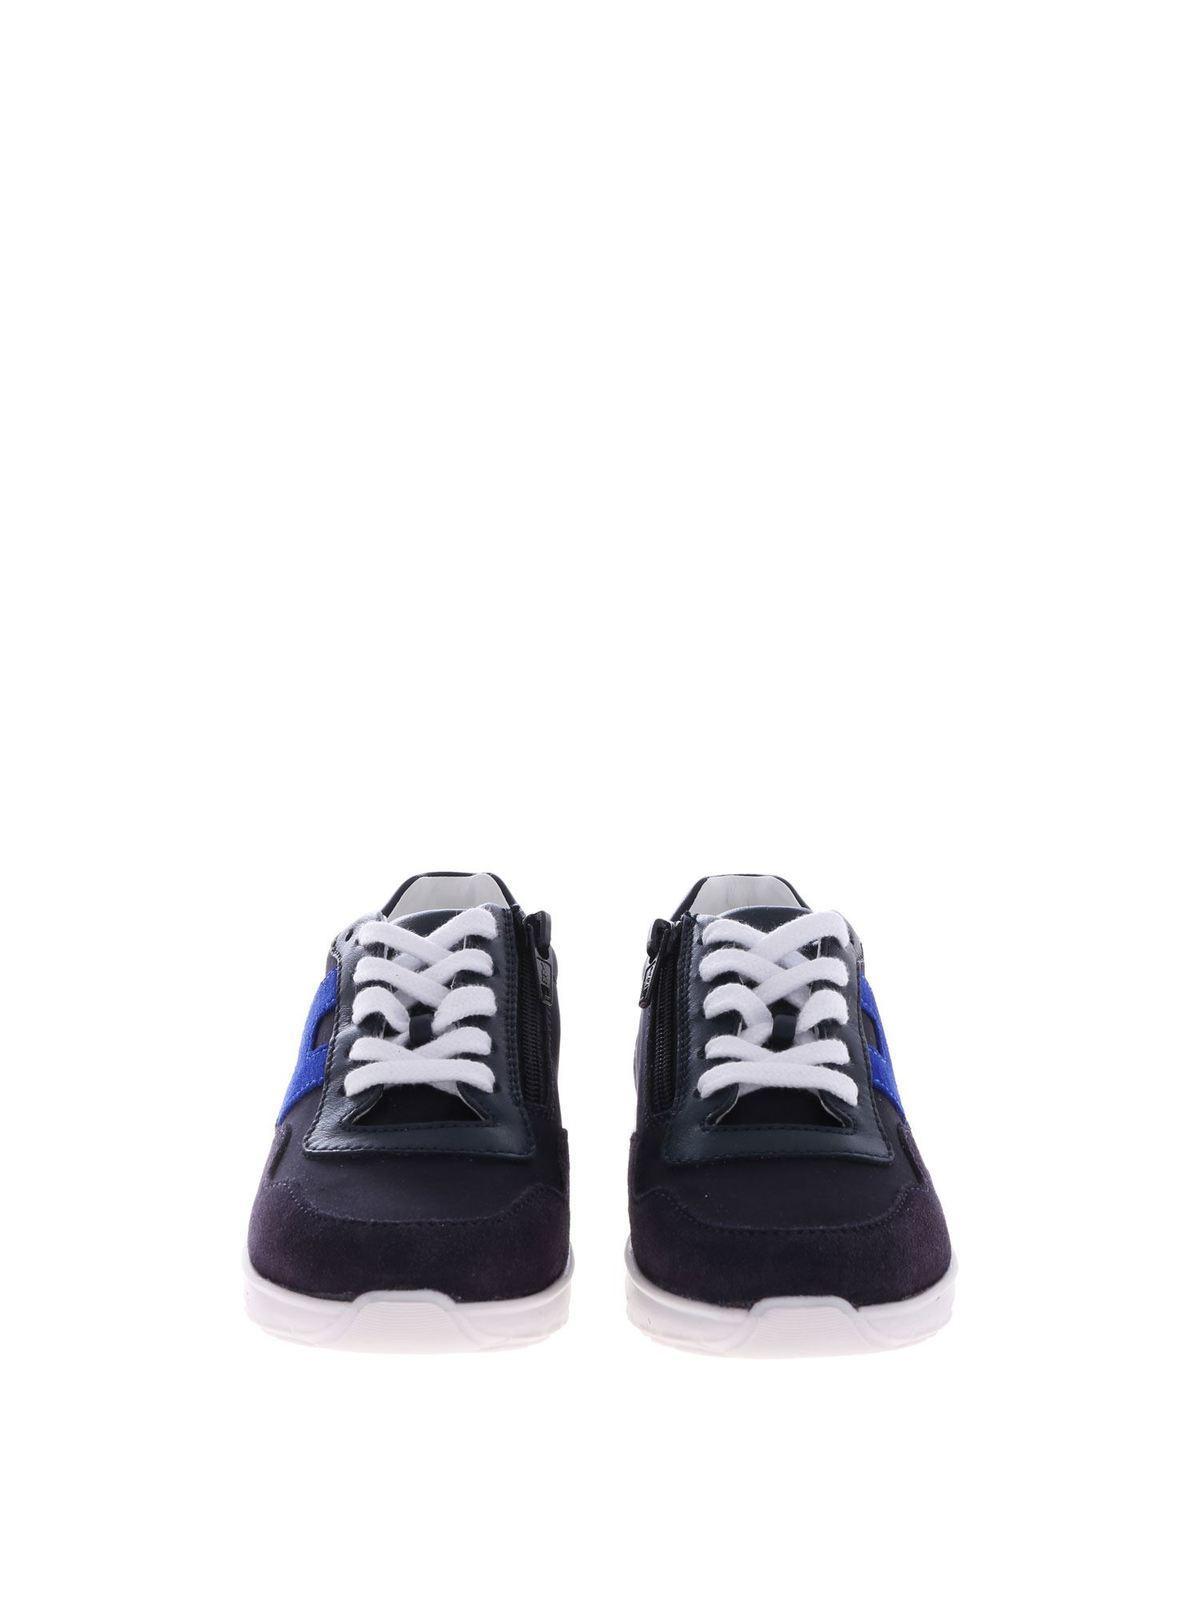 Hogan Junior - J371 suede sneakers - trainers - HXT3710AP30KK6694P